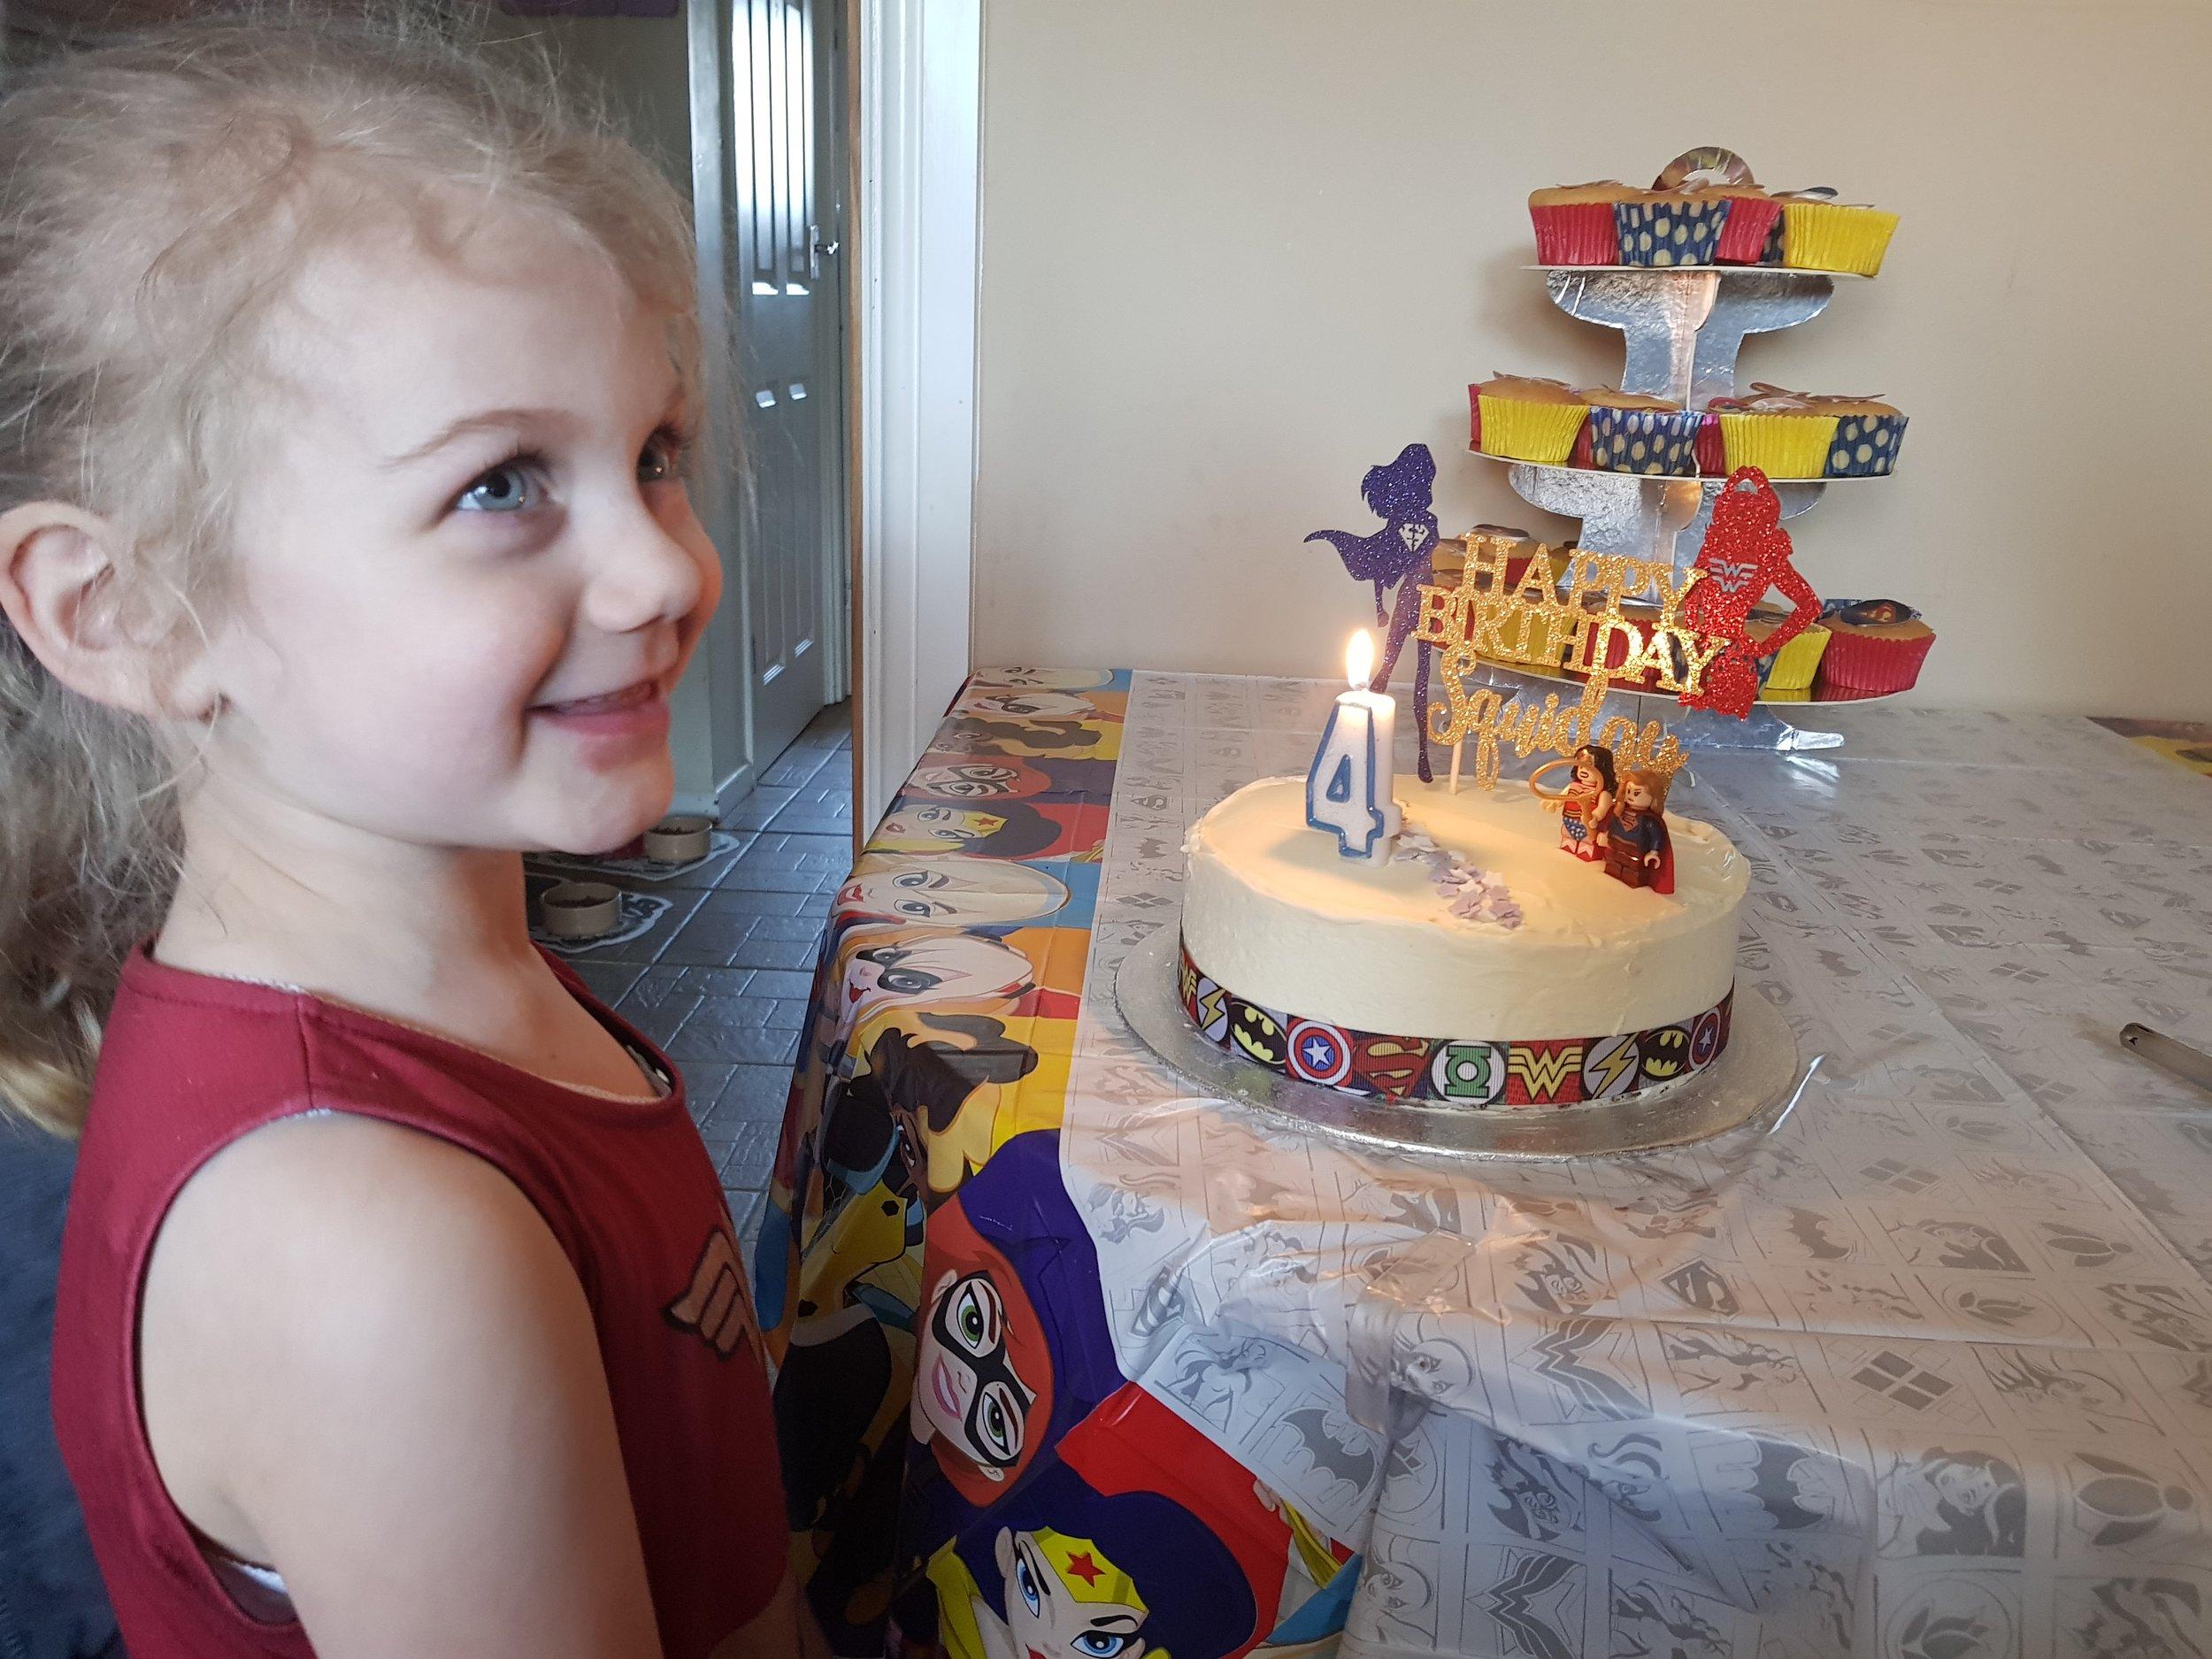 Wonder Woman Supergirl birthday cake moments